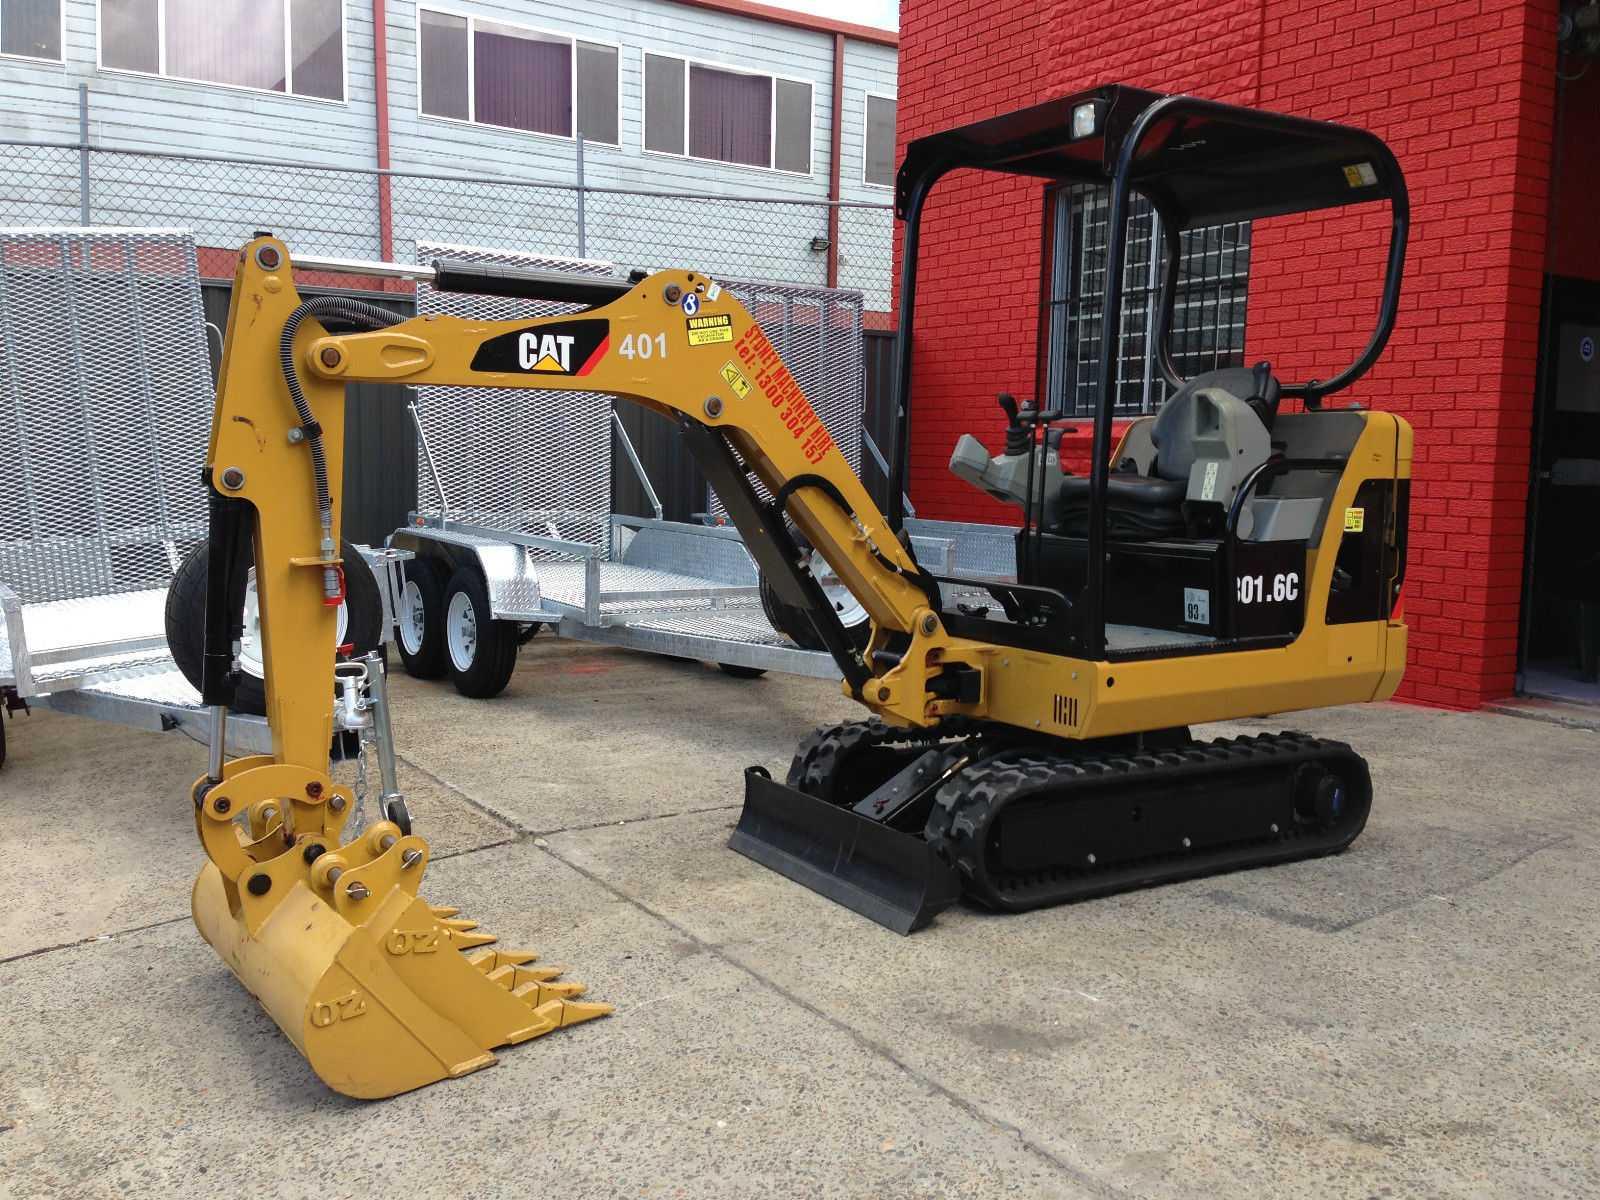 Hire 1.6 tonne tight access mini excavator + 3 buckets & trailer